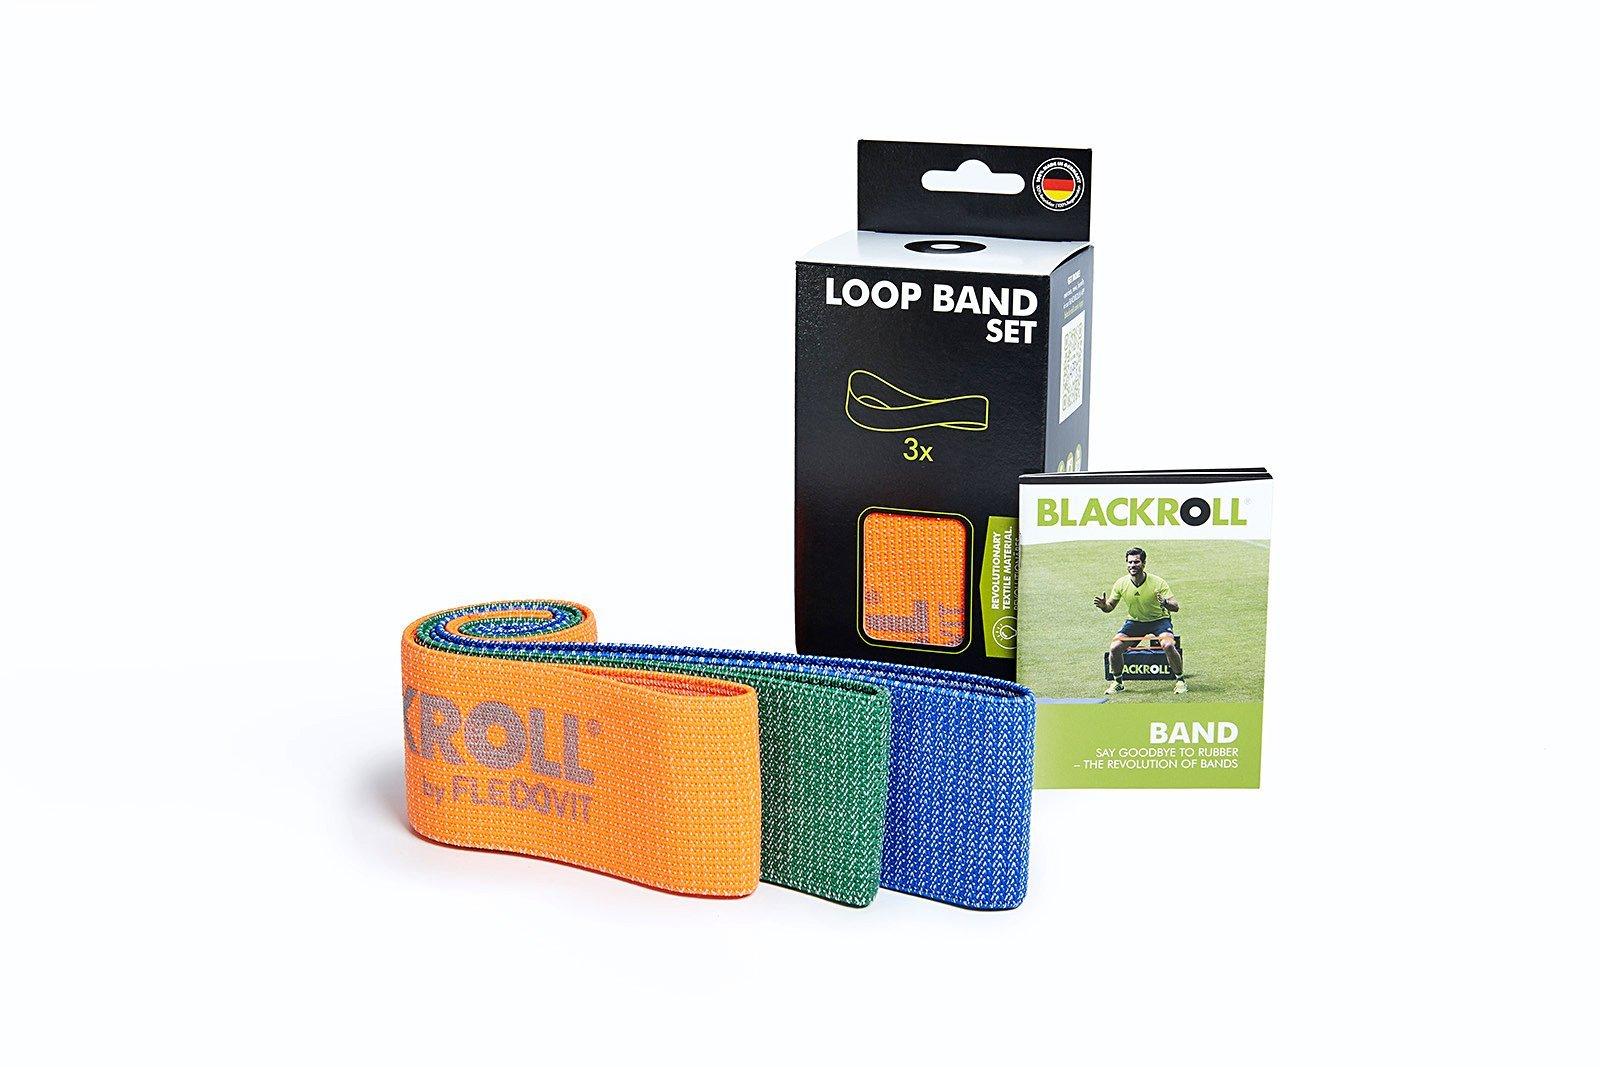 BLACKROLL® LOOP BAND SET